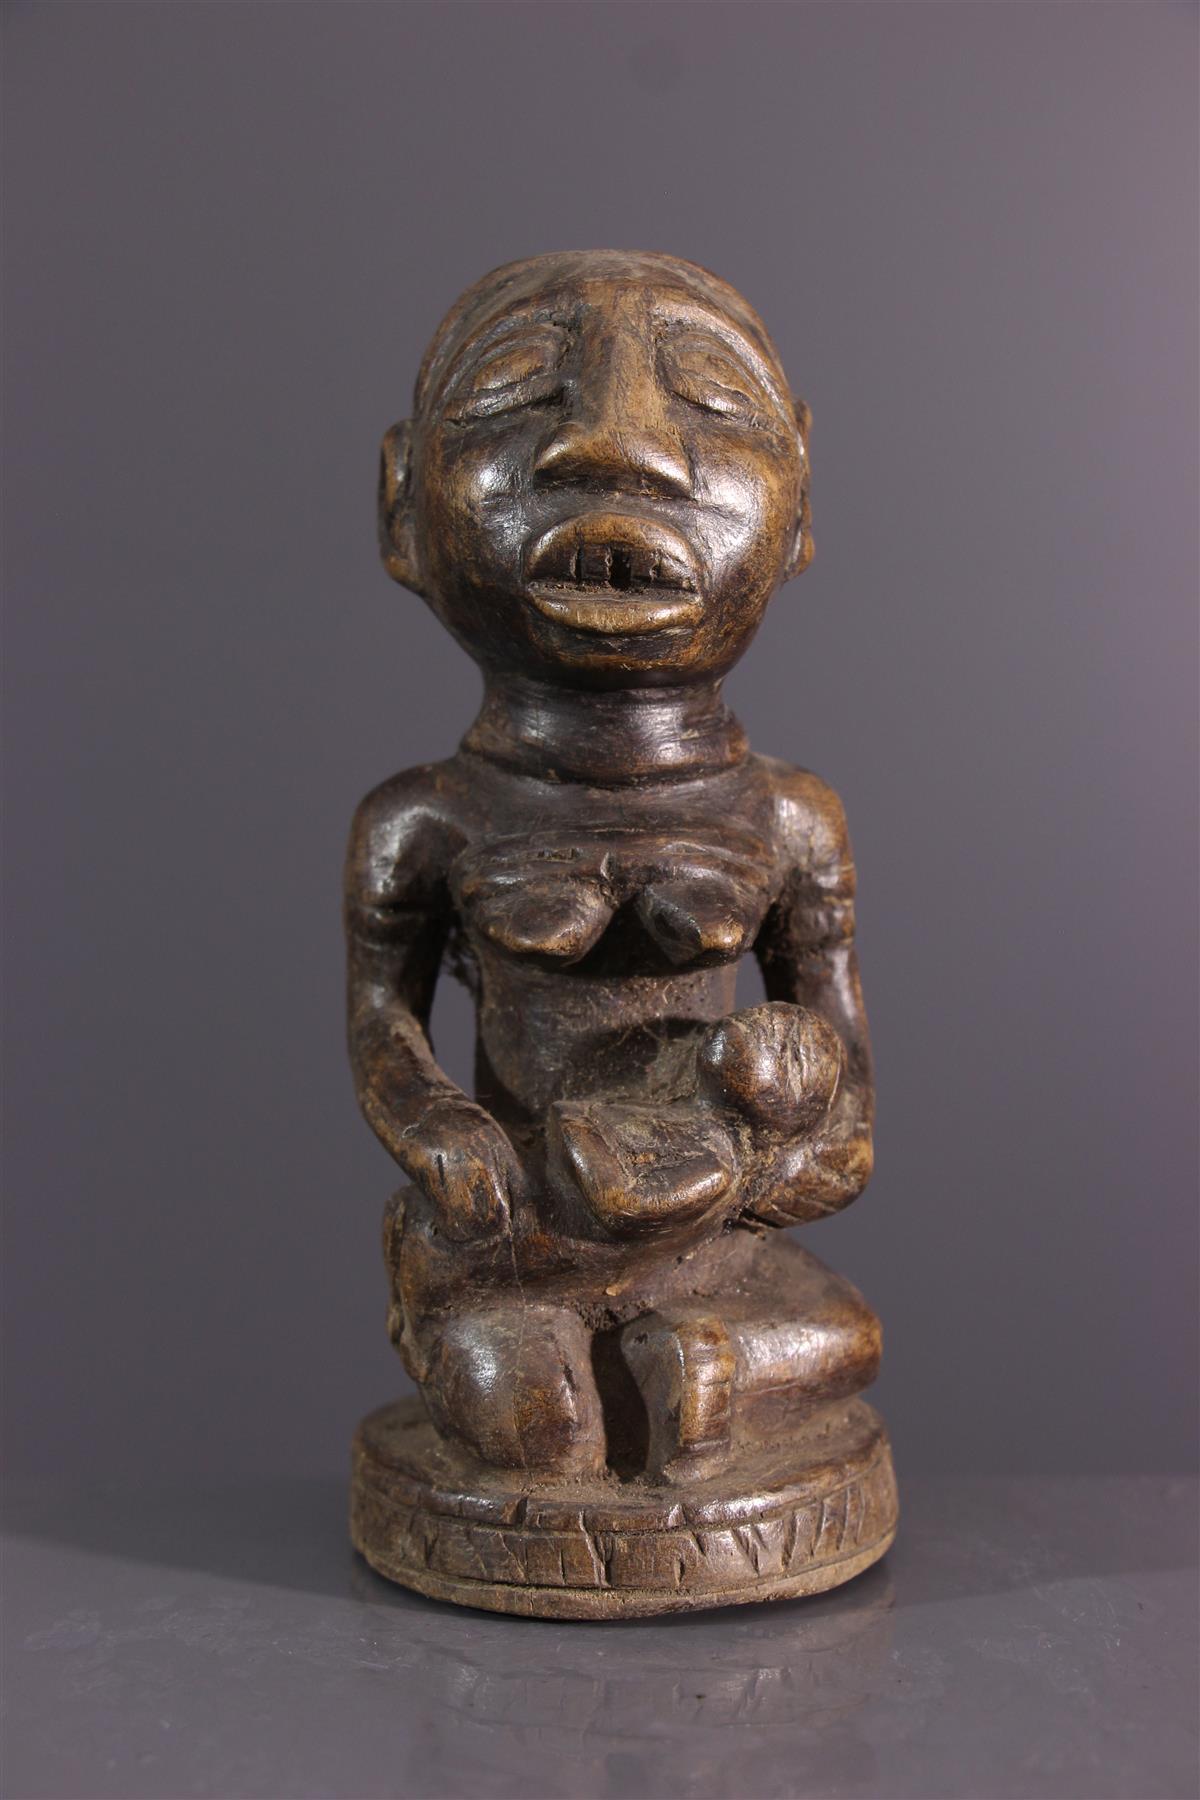 Statuette Pfemba - African art